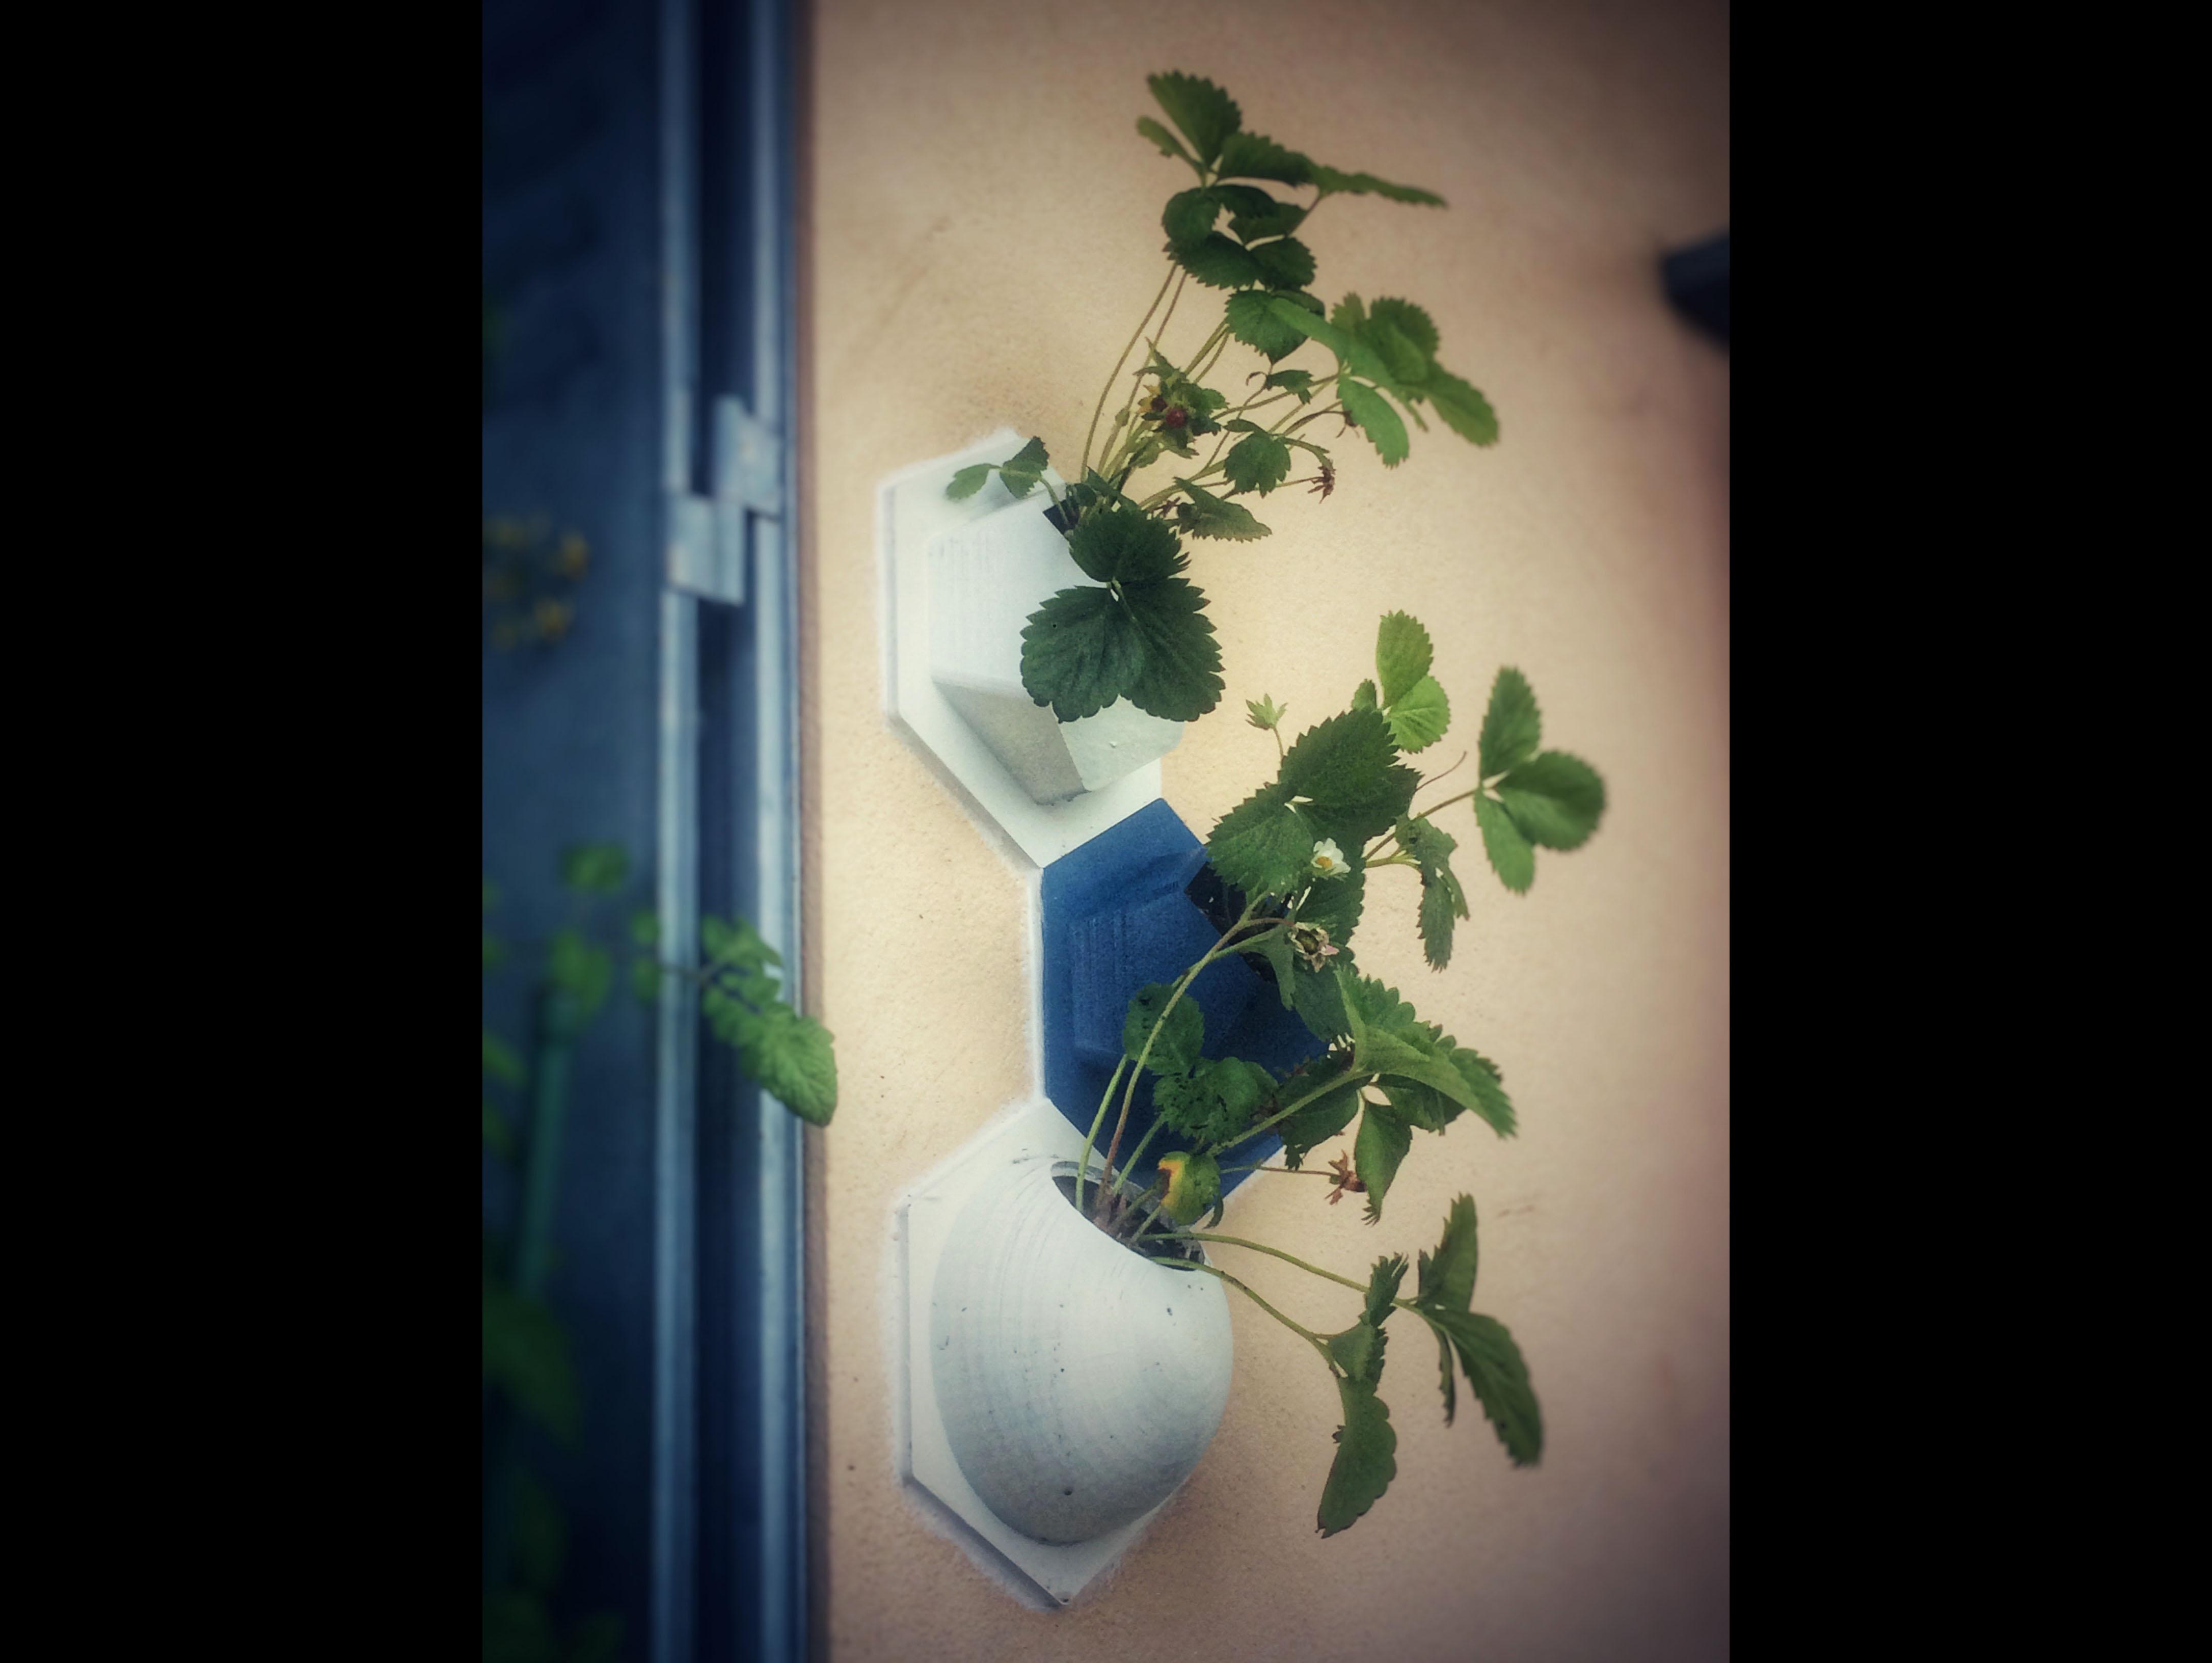 WALL_PLANT_04.JPG Download free STL file Wall Plantations • 3D printing object, JosephKerr